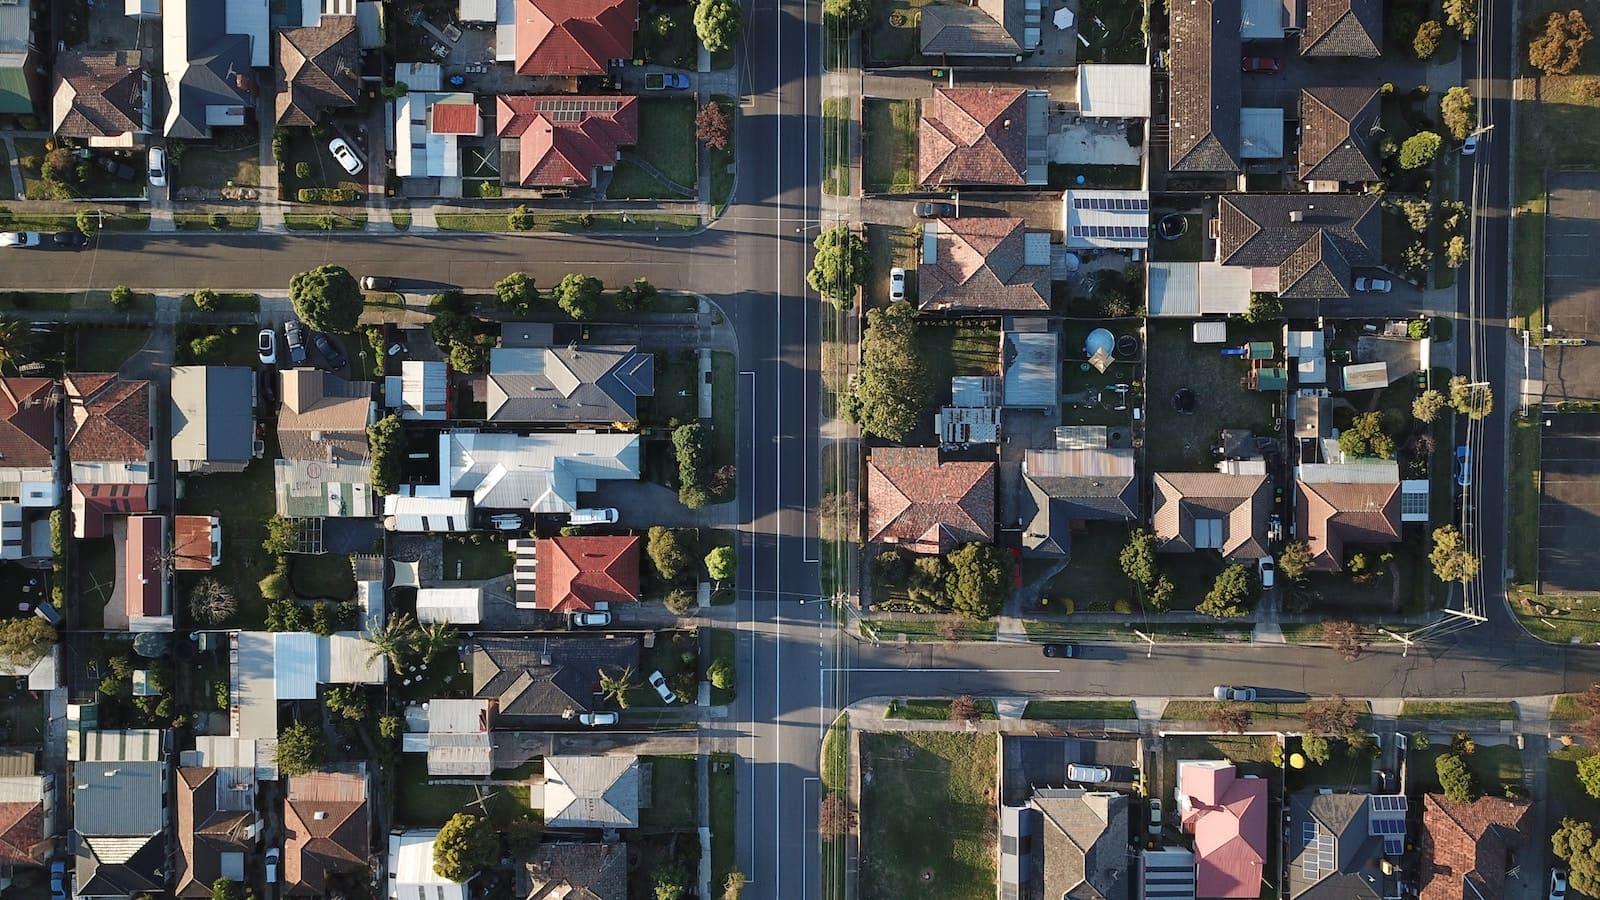 The housing shortage